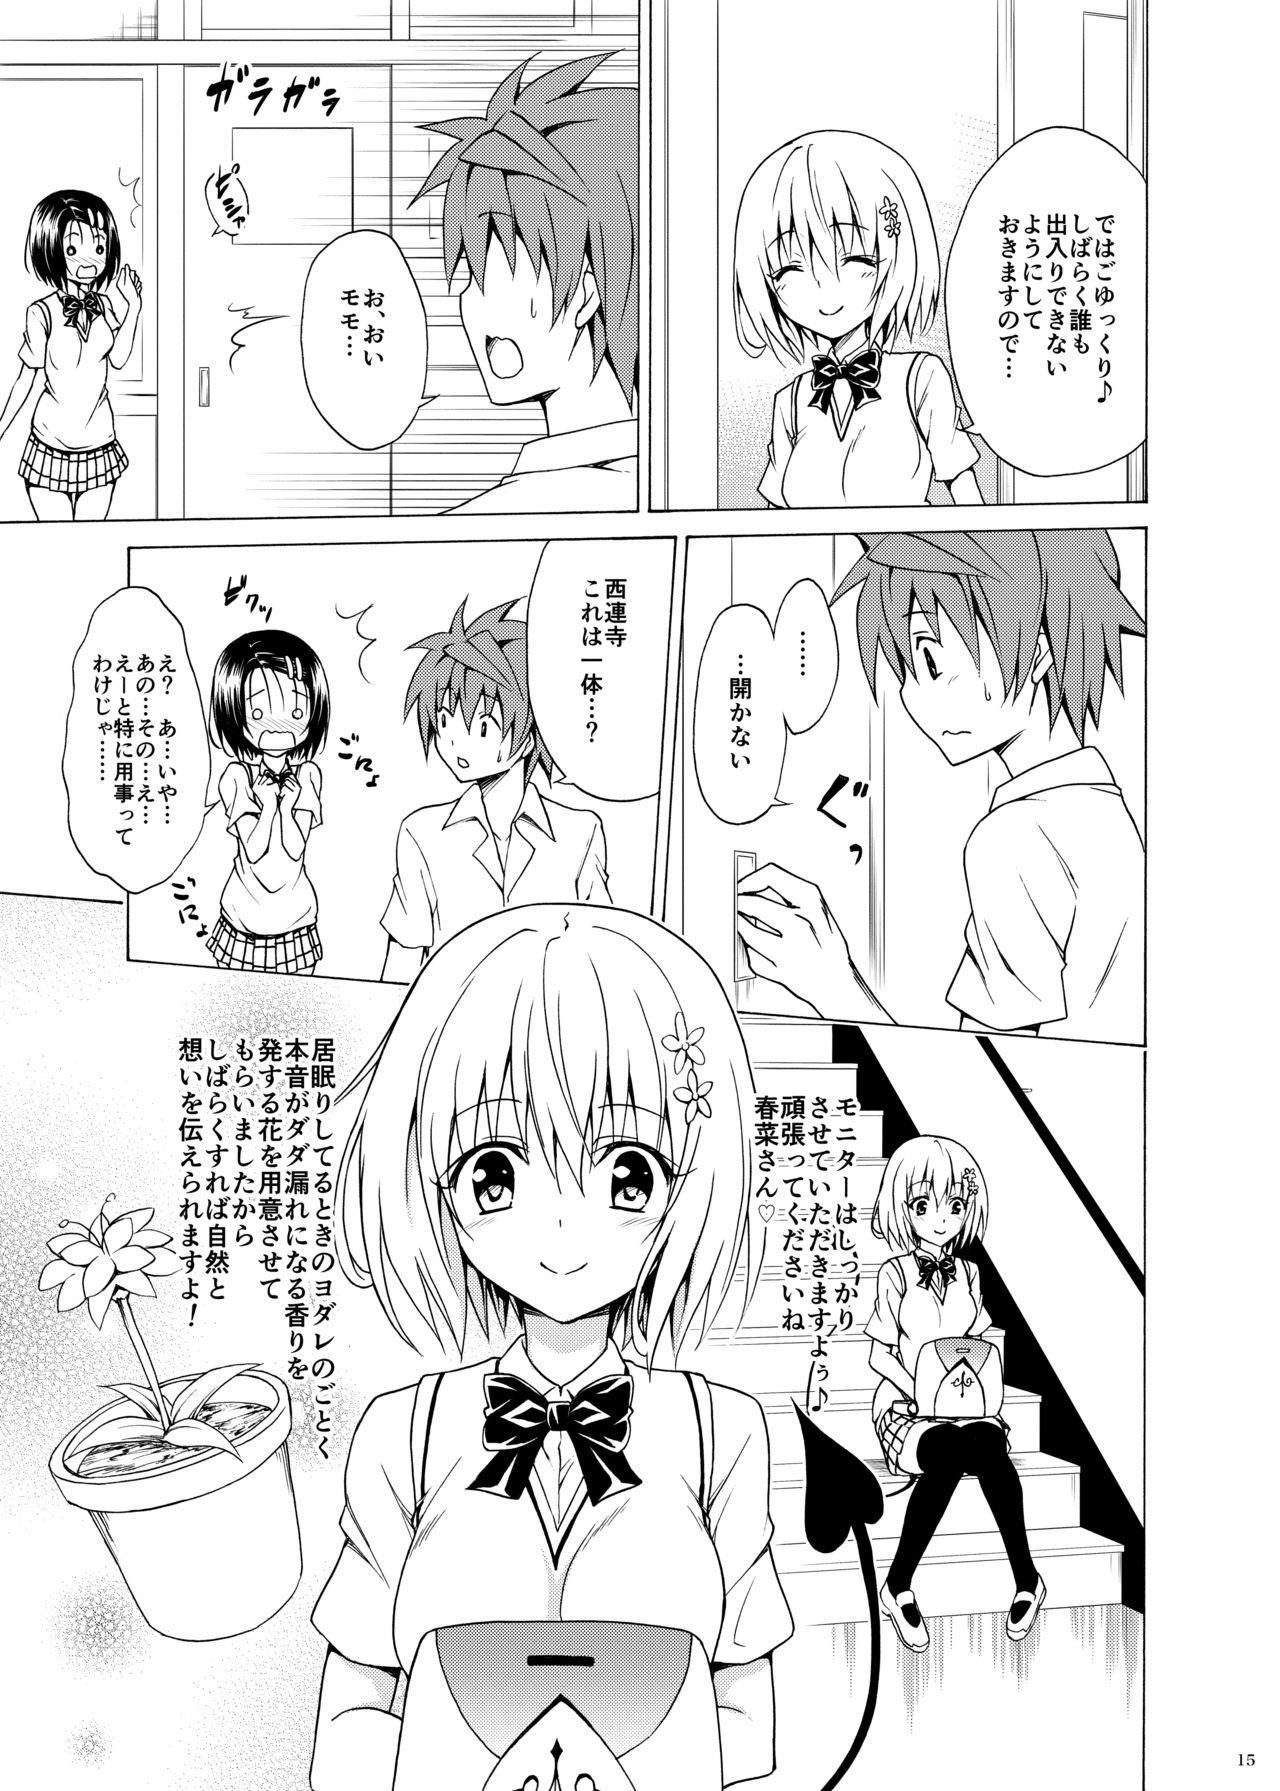 Mezase! Rakuen Keikaku Vol. 2 13